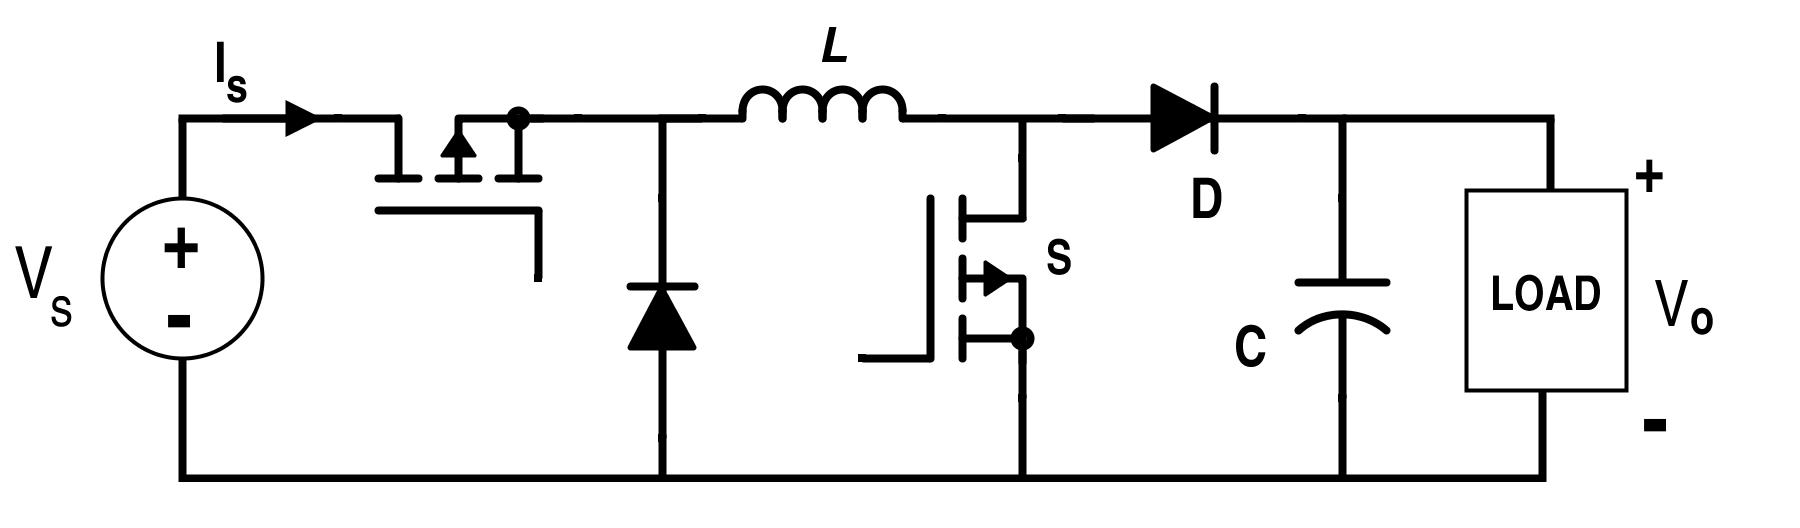 Dc Boost Converter Circuit Simple